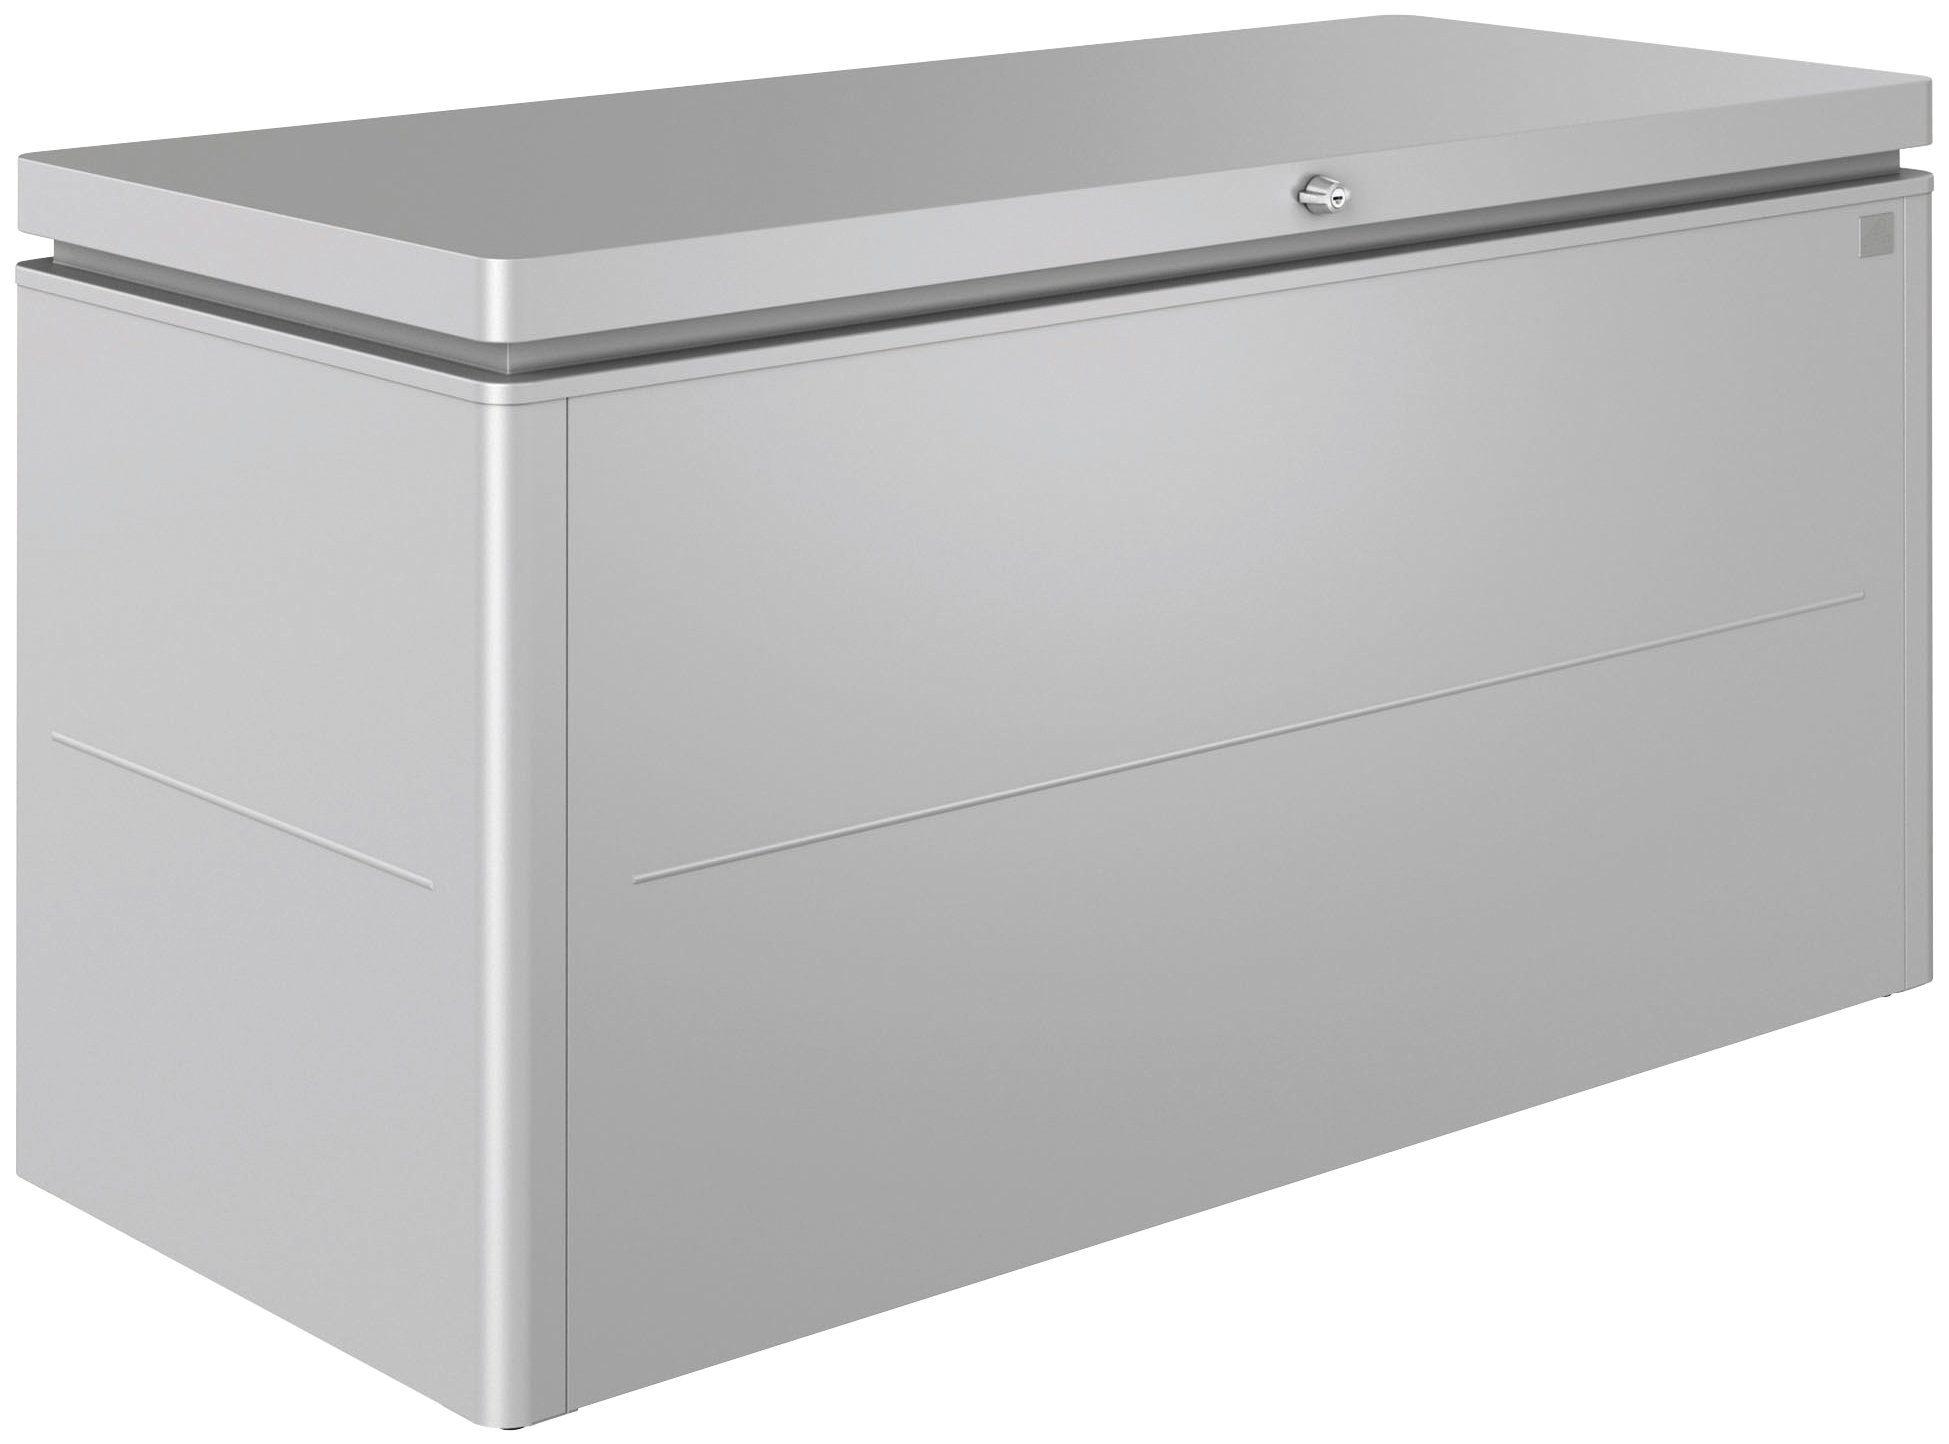 Biohort Aufbewahrungsbox »LoungeBox Gr. 160«, B/T/H: 160/70/83,5 cm, silberfarben metallic